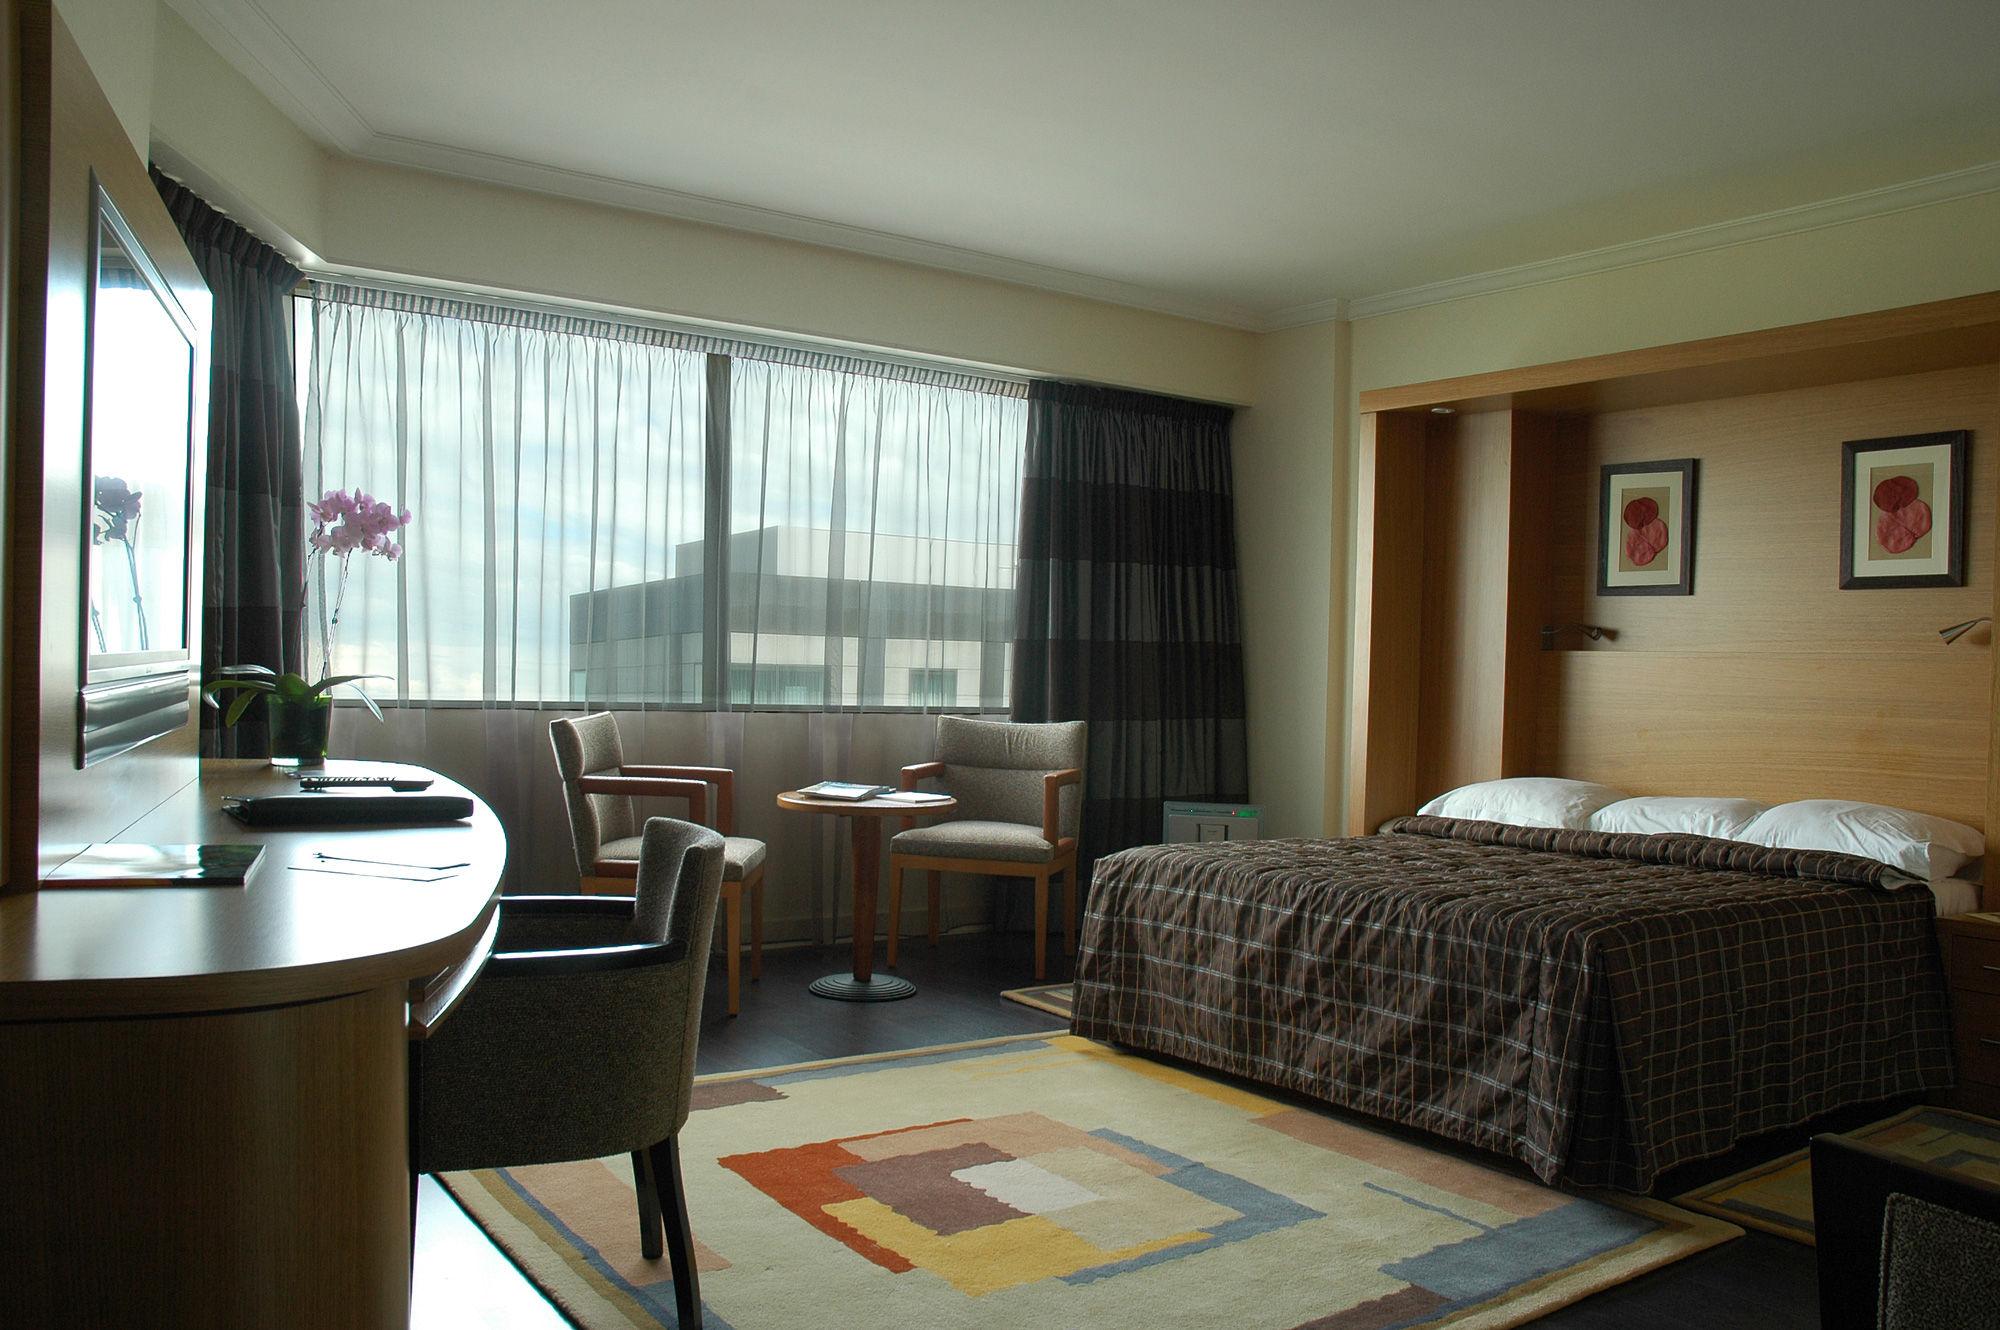 Chambre d\'hôtel contemporaine / modulable XAVIER LIFTSECURITY / BUREAU  HOTEL / MBED